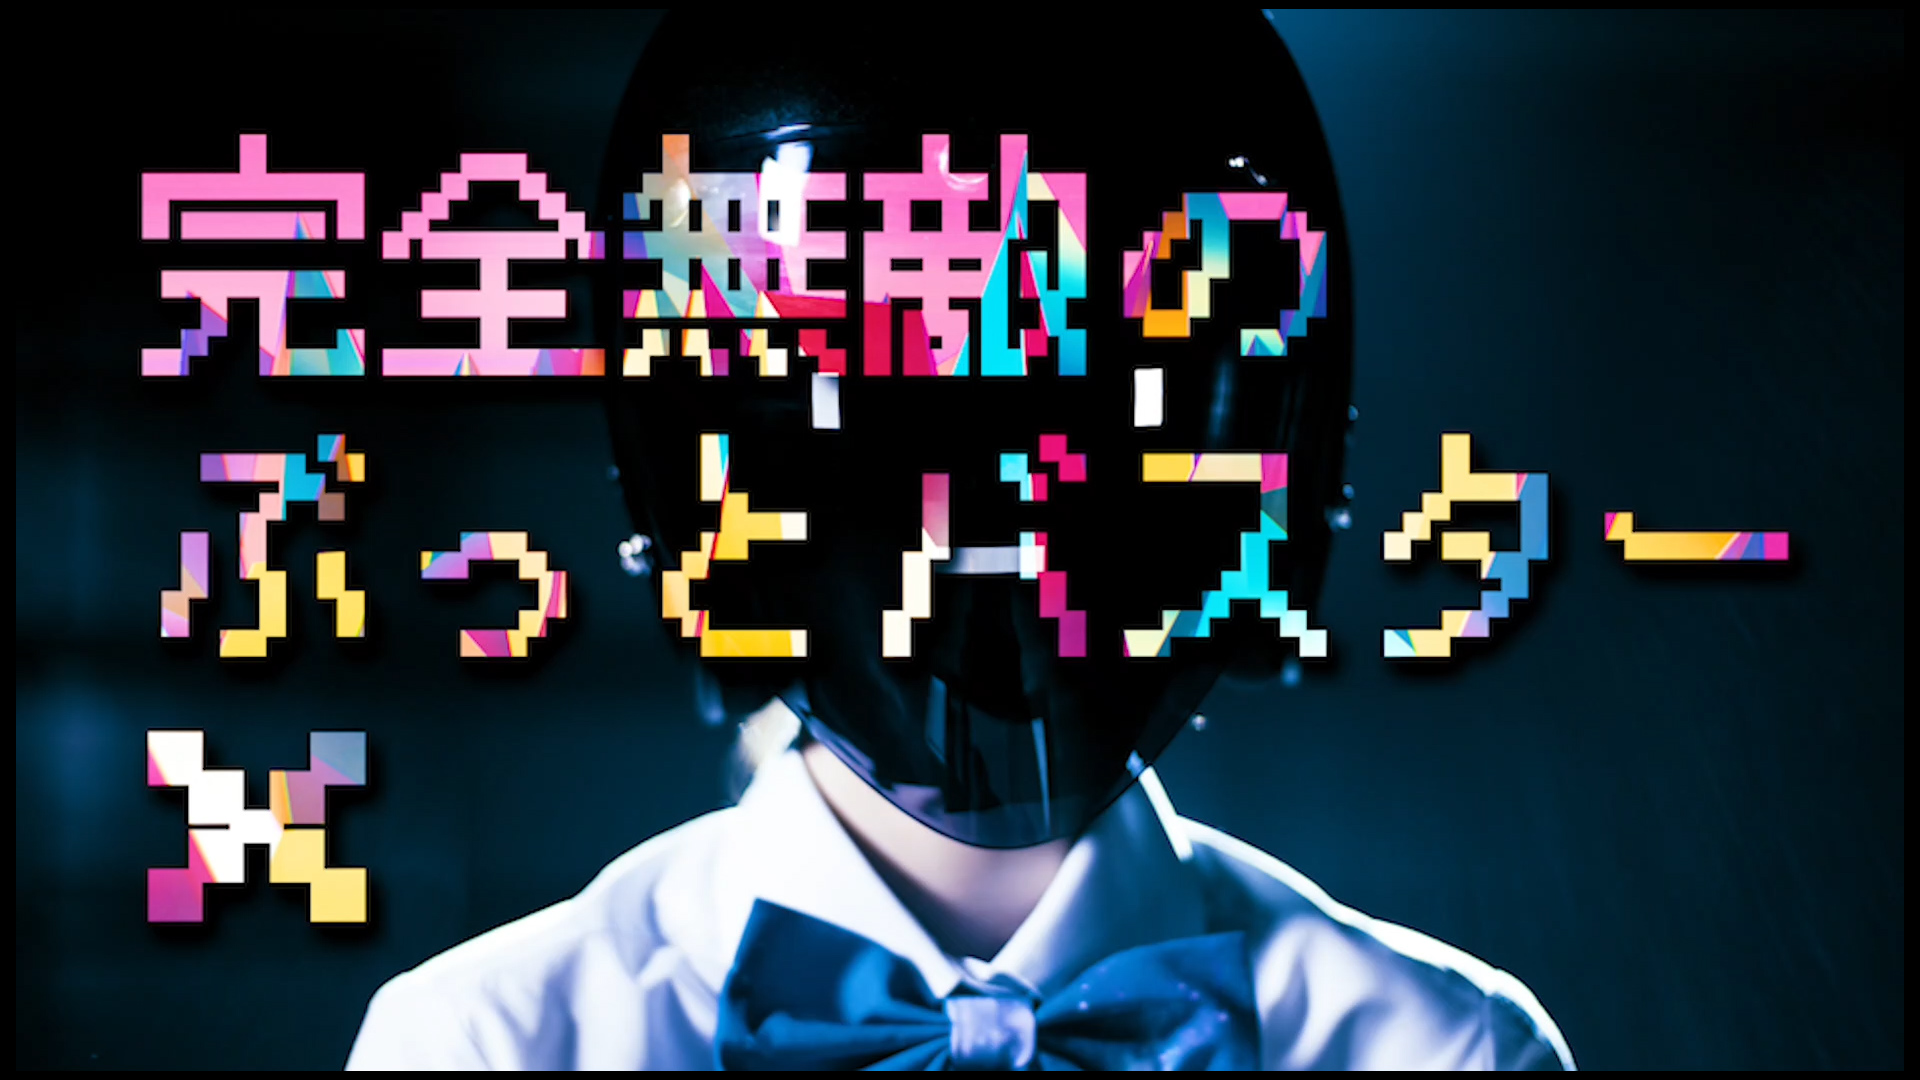 Sony Music Labels Inc.<br>魔法少女になり隊「完全無敵のぶっとバスターX」